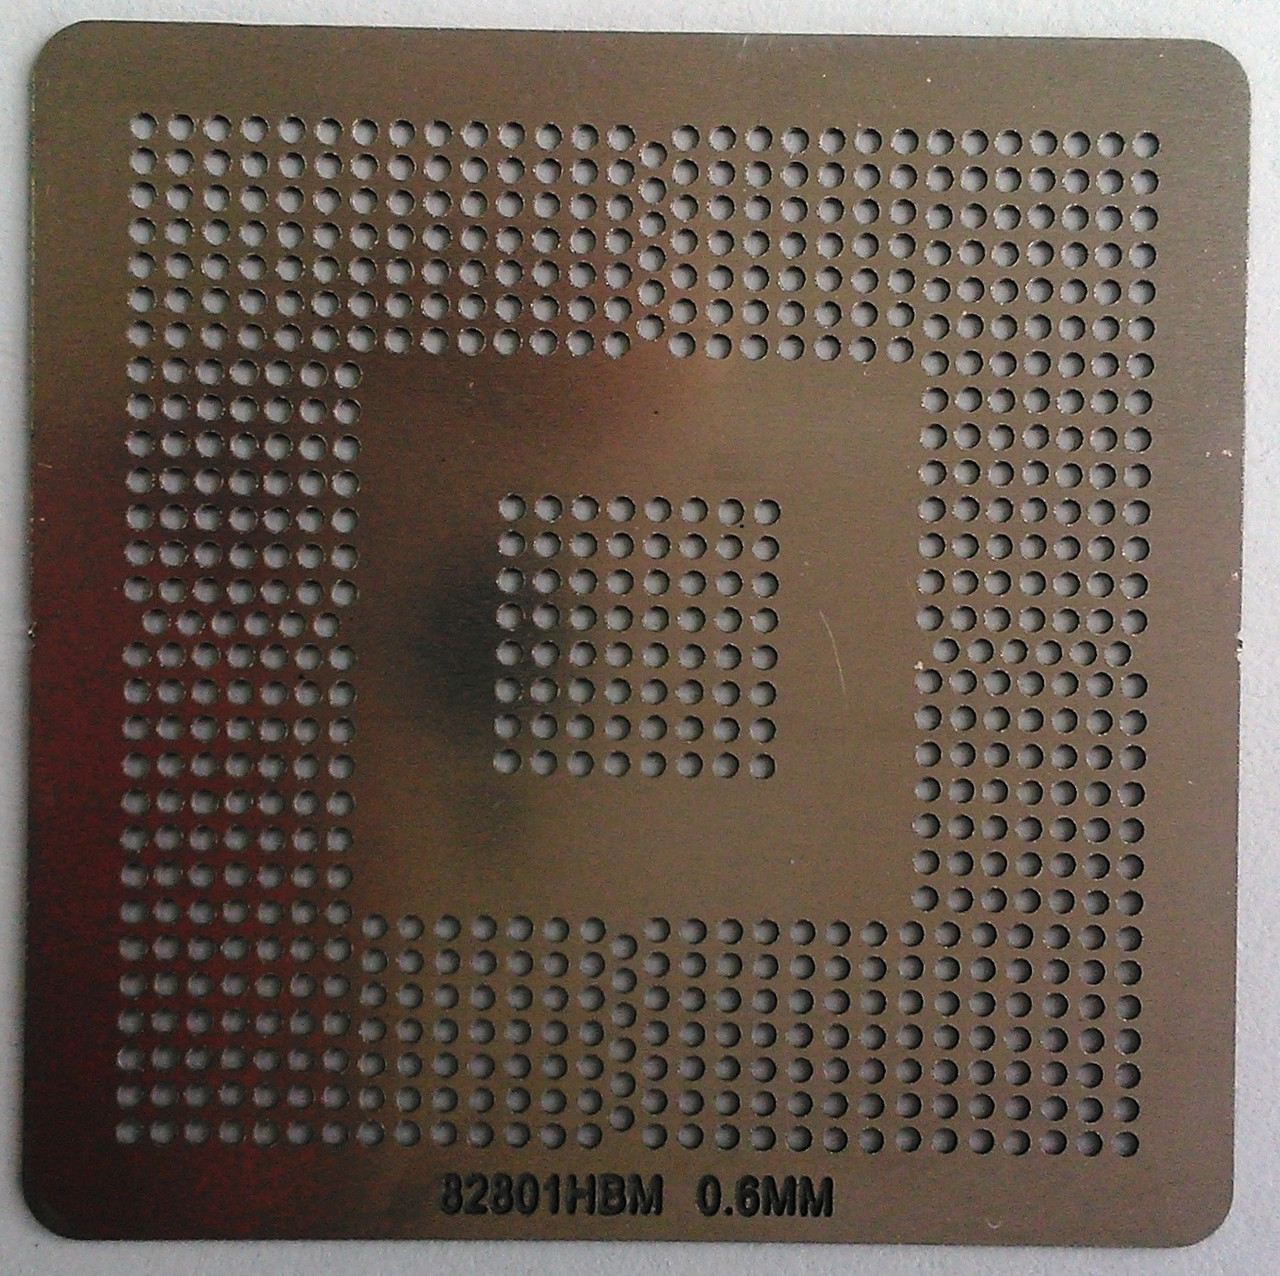 BGA трафарет 82801HBM 0,6mm